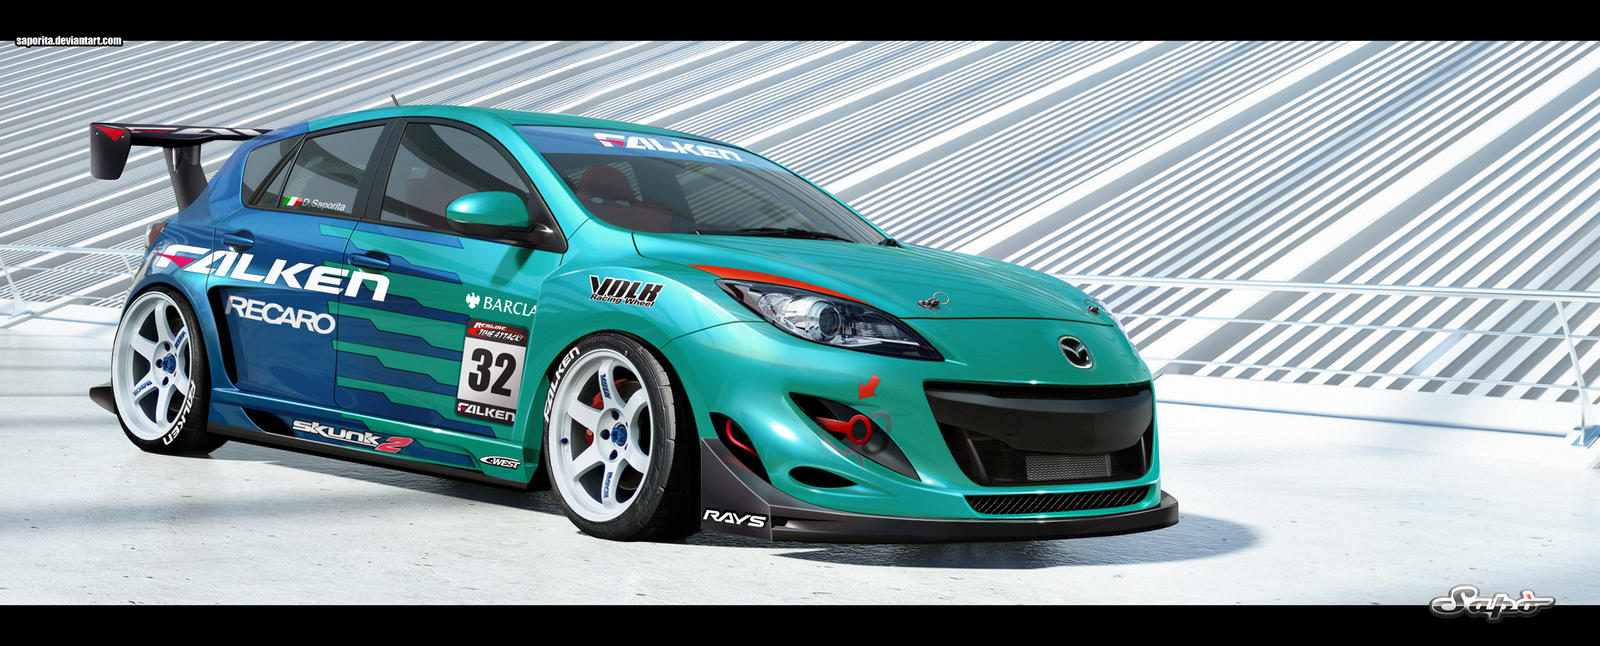 Mazda Mazda3 history, photos on Better Parts LTD